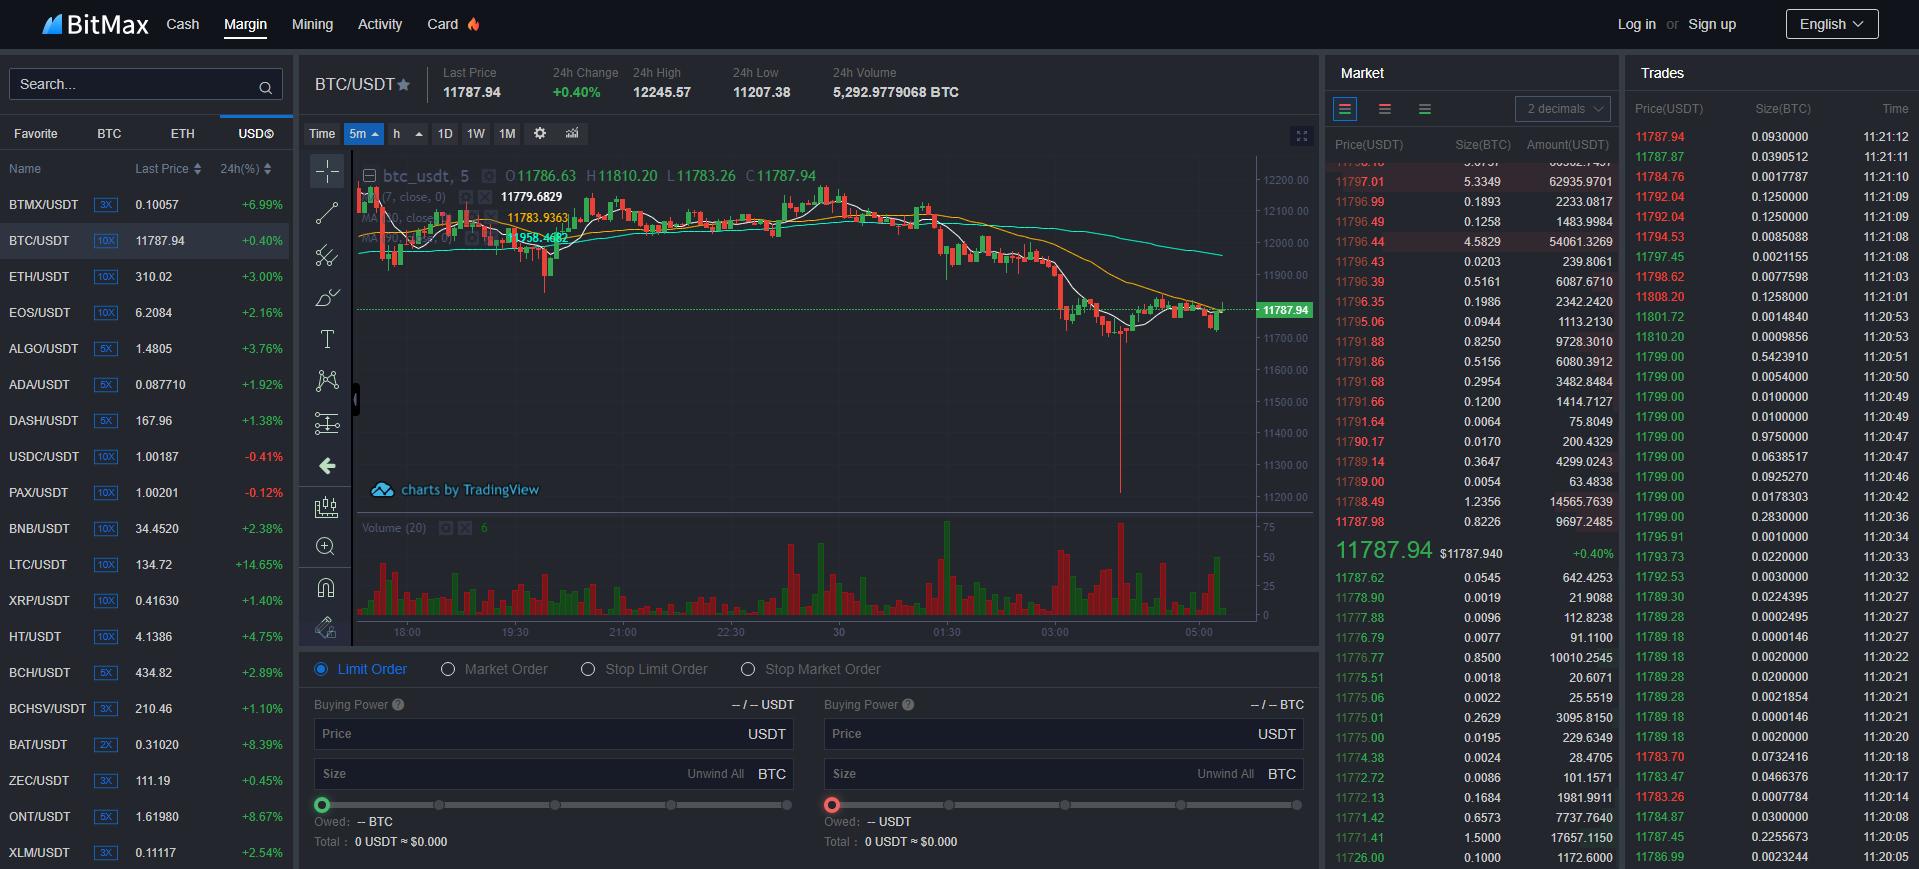 Bitmax.io Chart